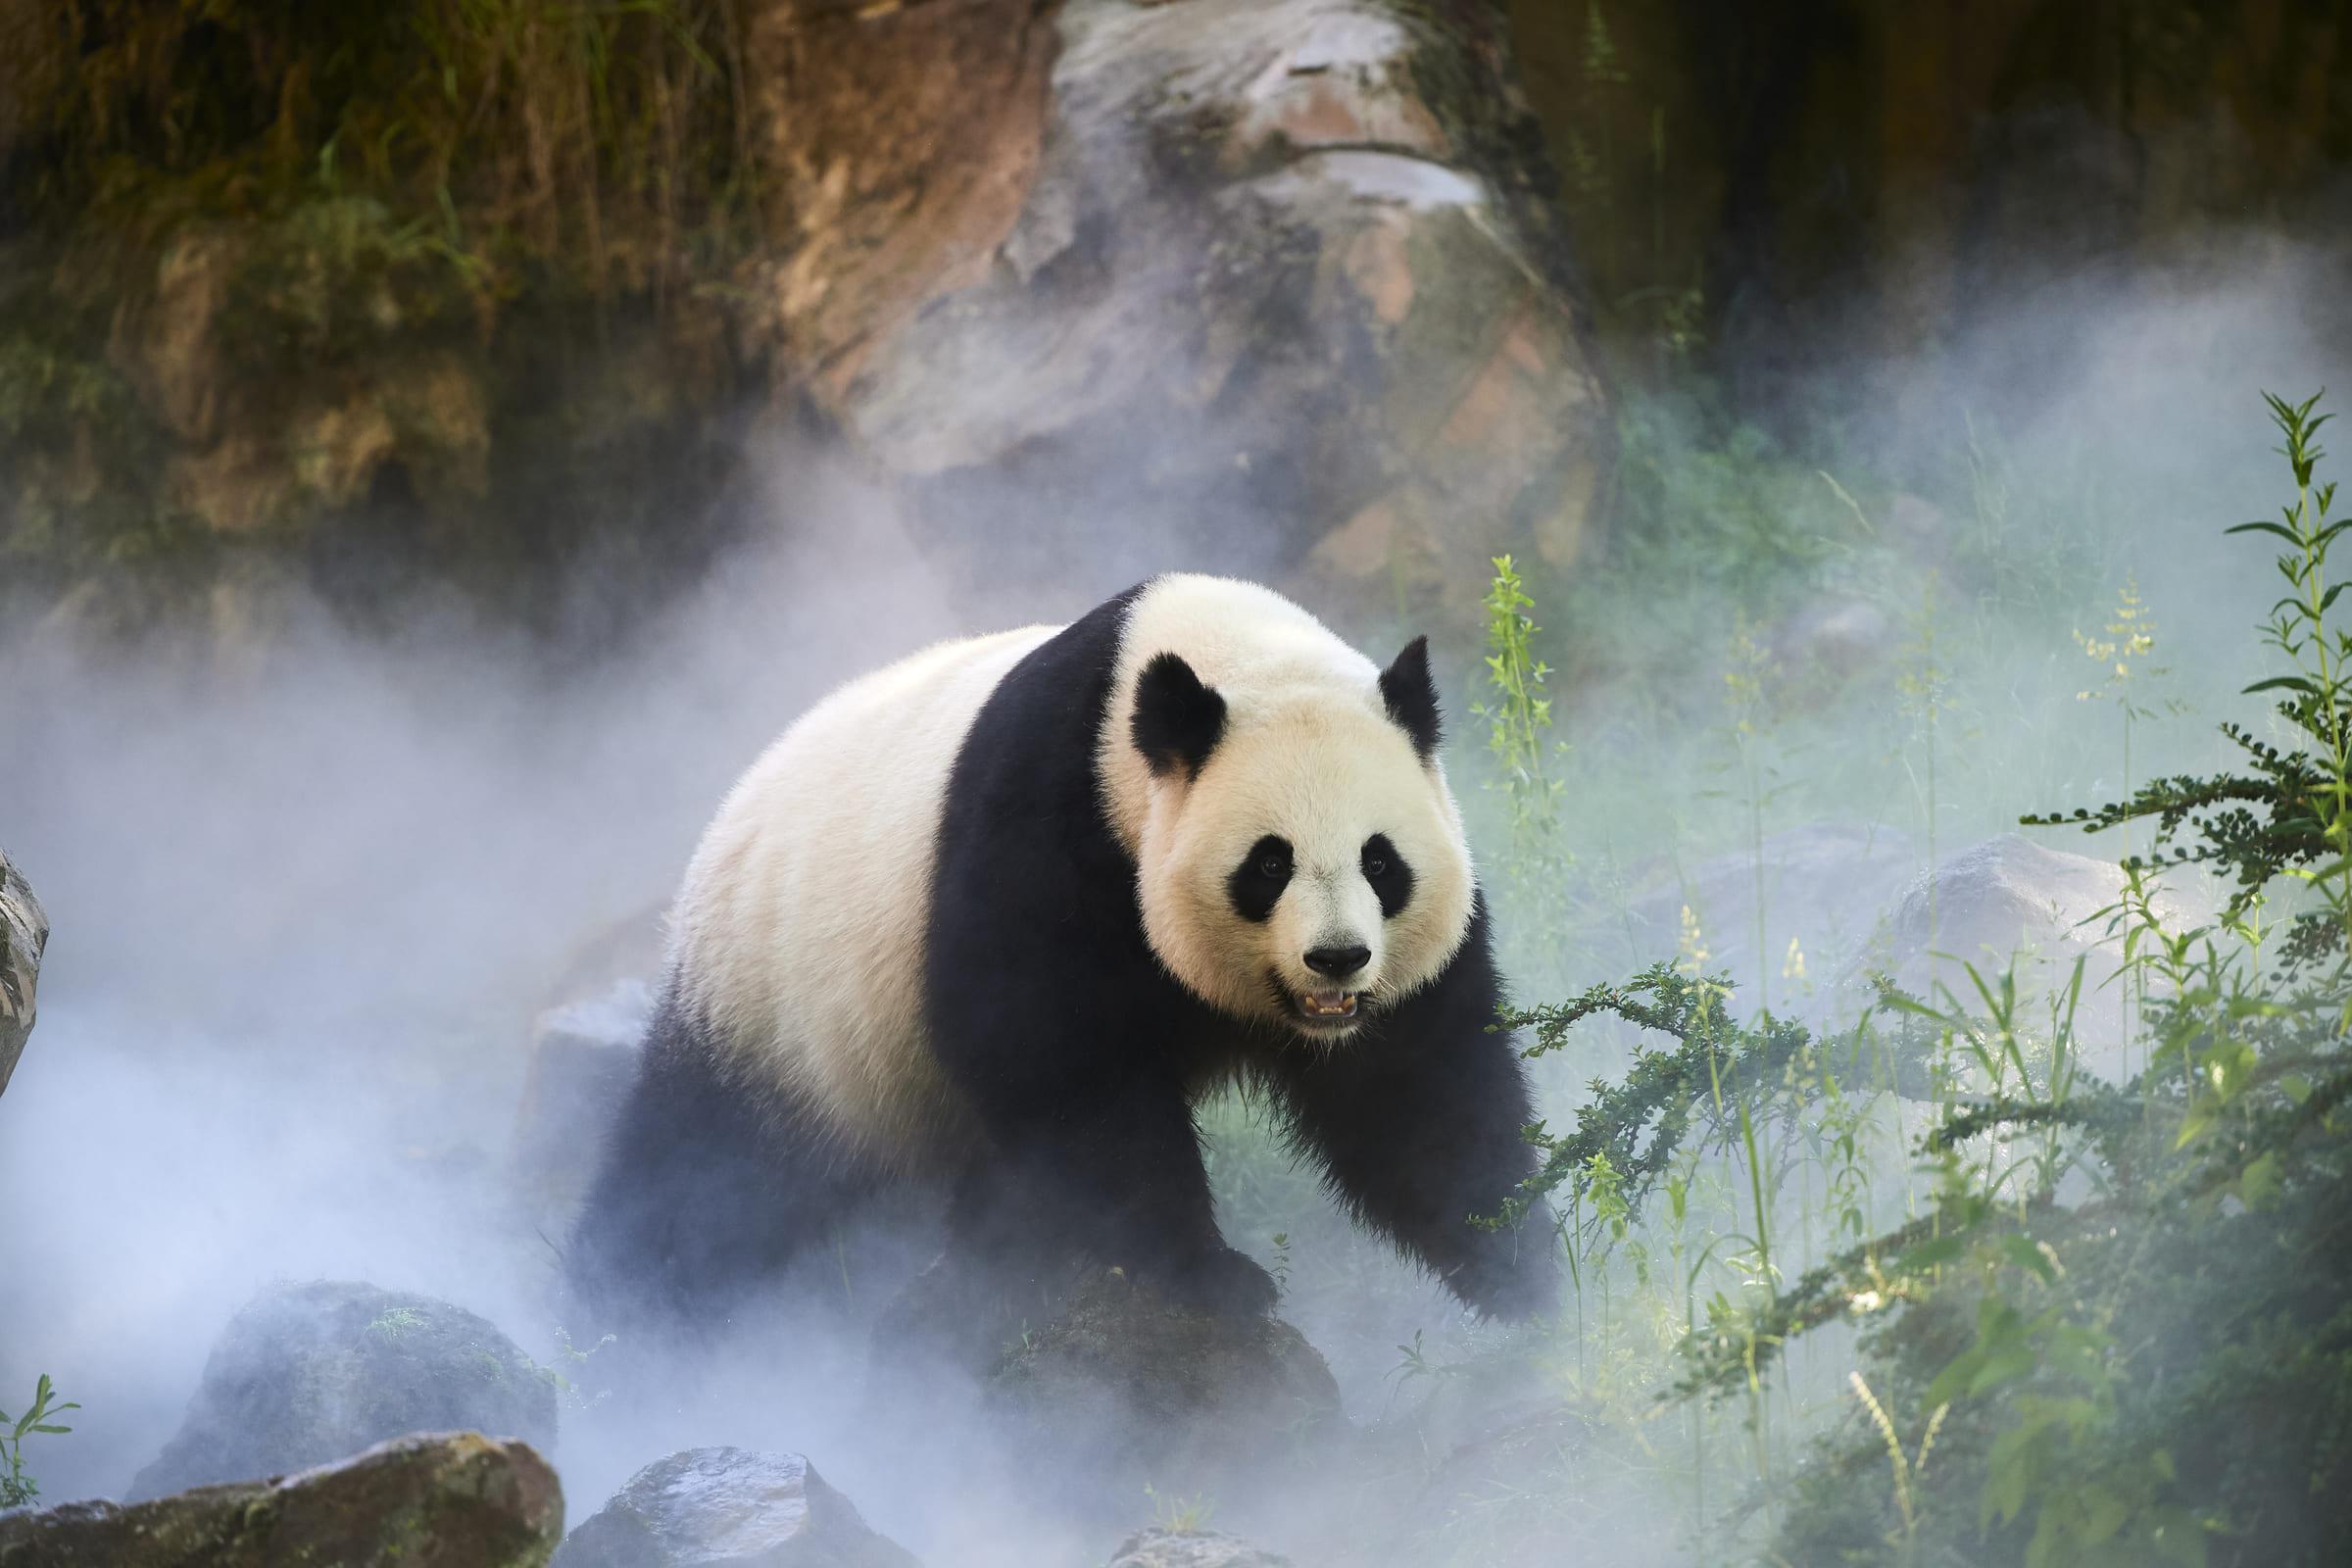 Grosser Panda im Nebel